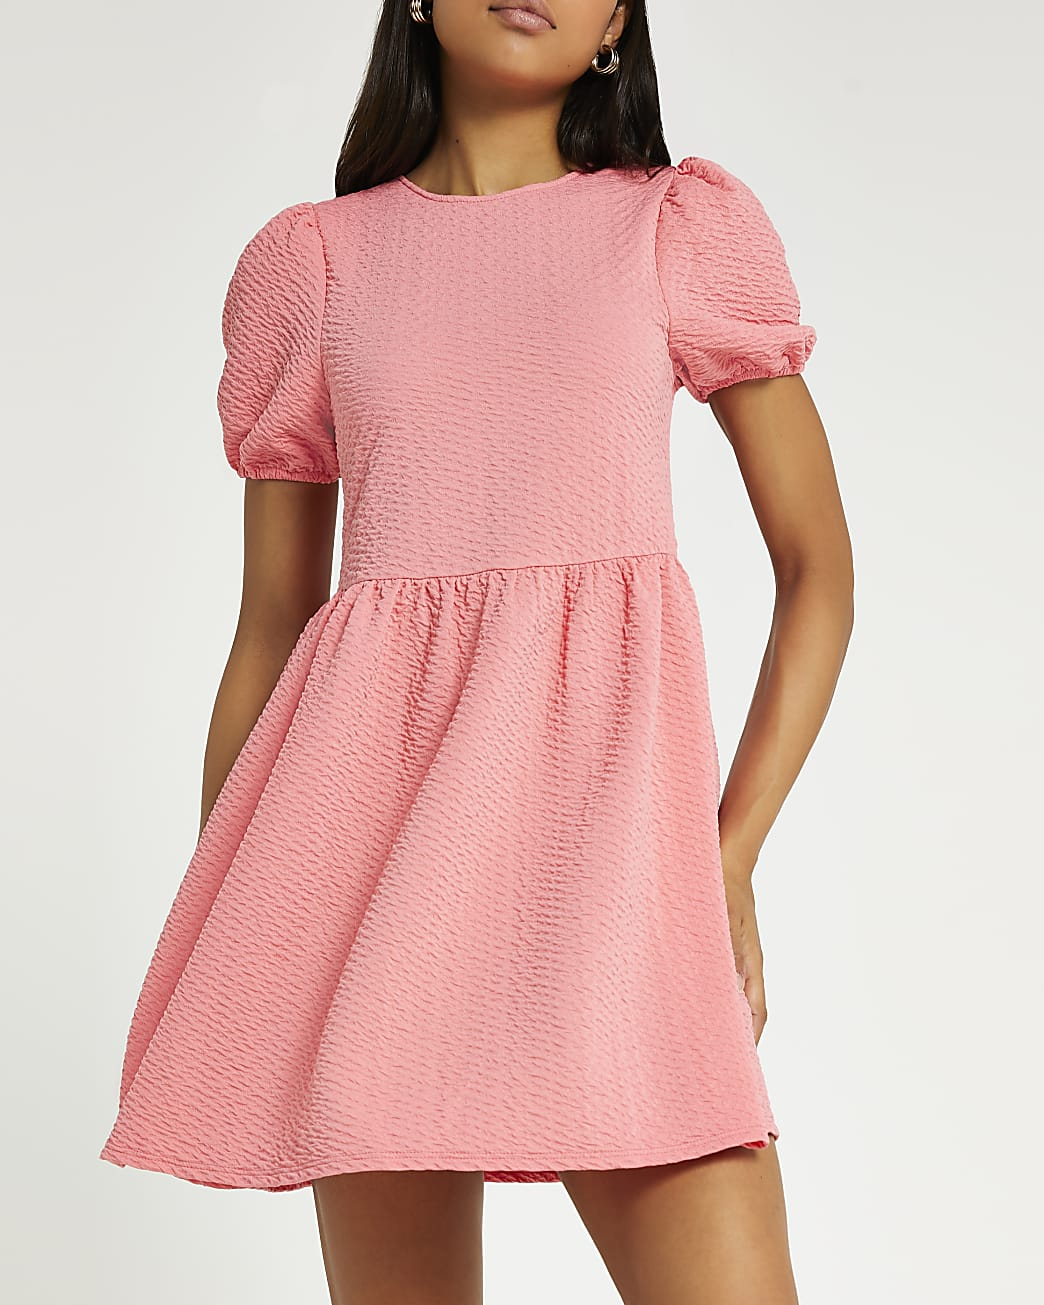 Coral bow detail mini dress